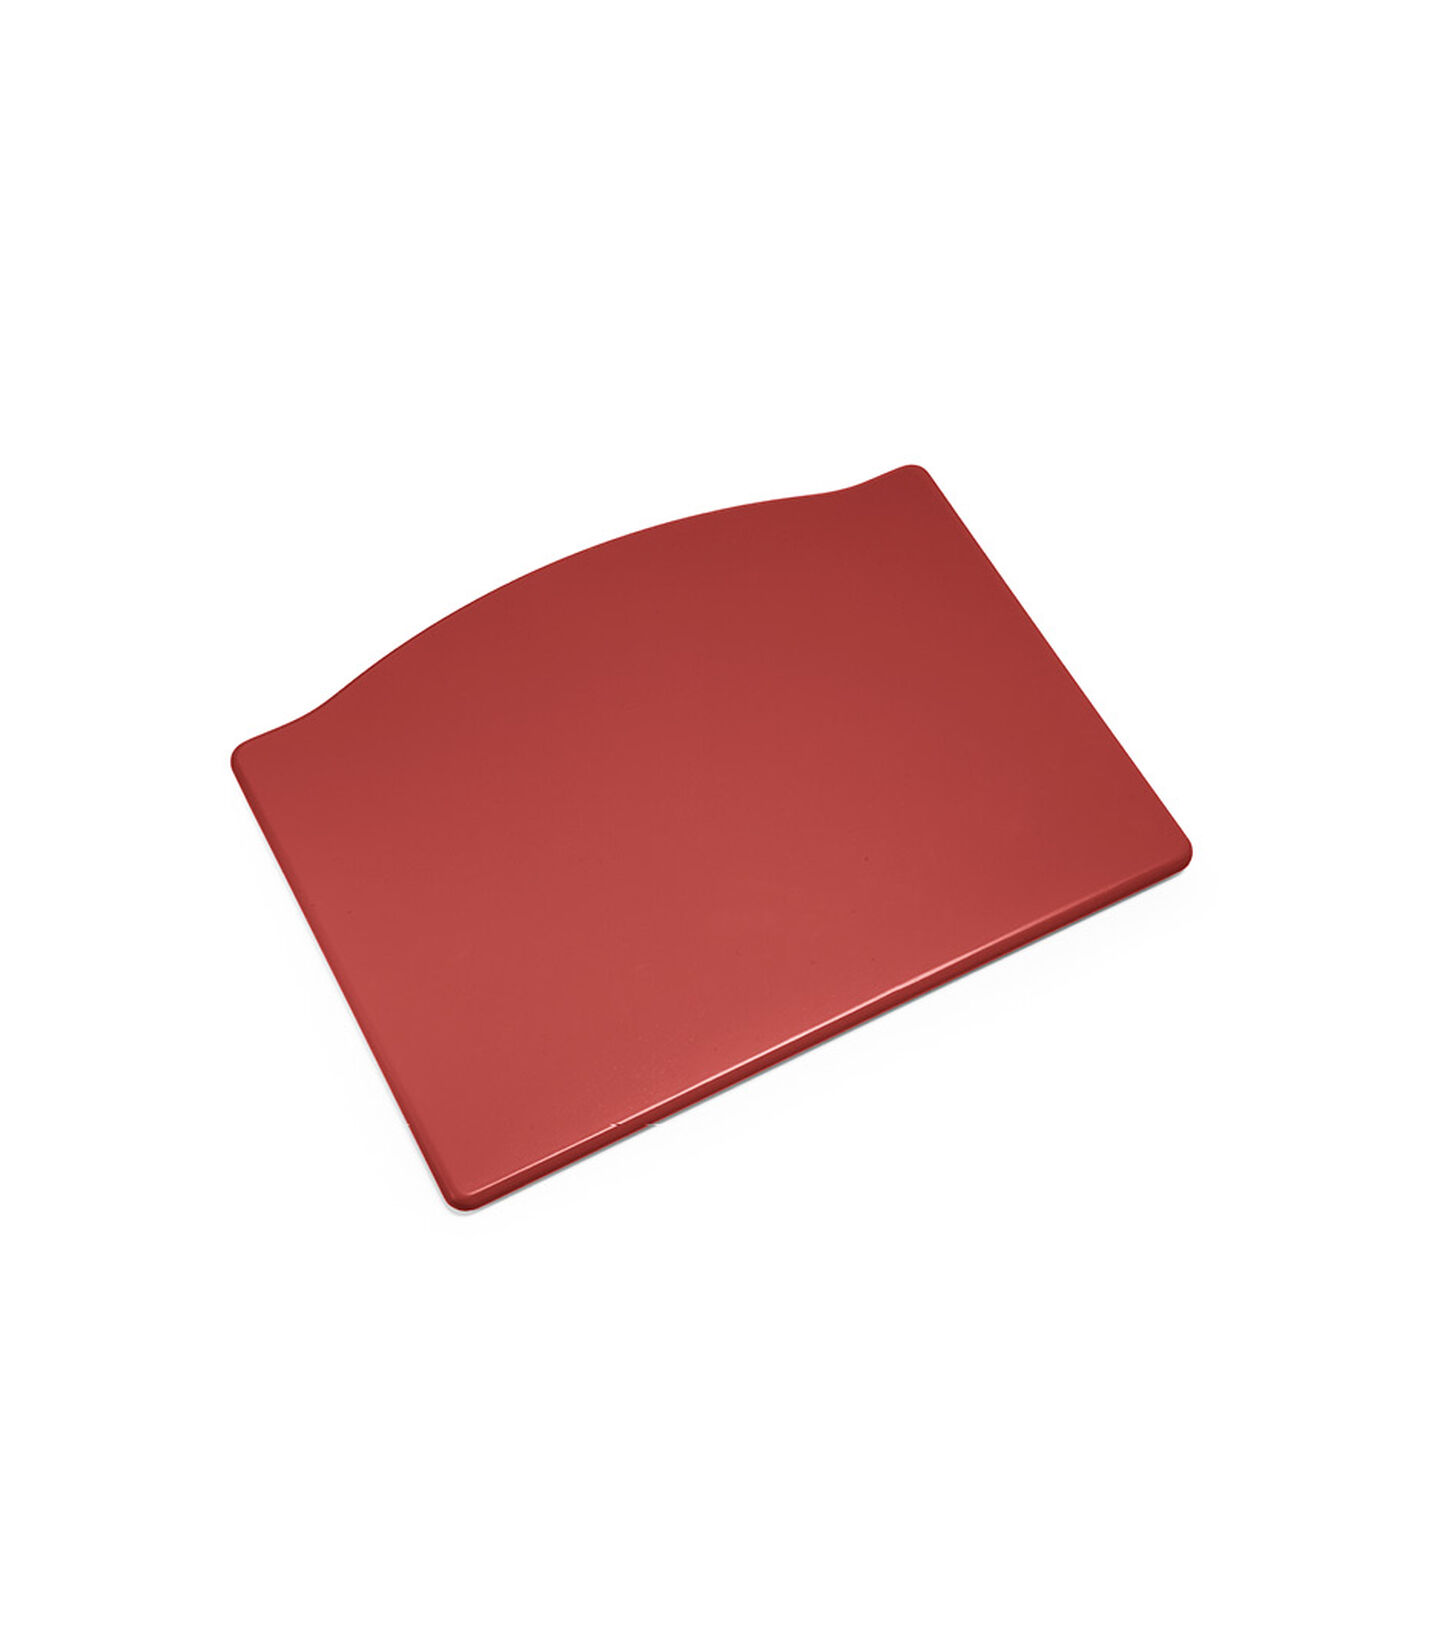 Tripp Trapp® Fußbrett Warm Red, Warm Red, mainview view 1